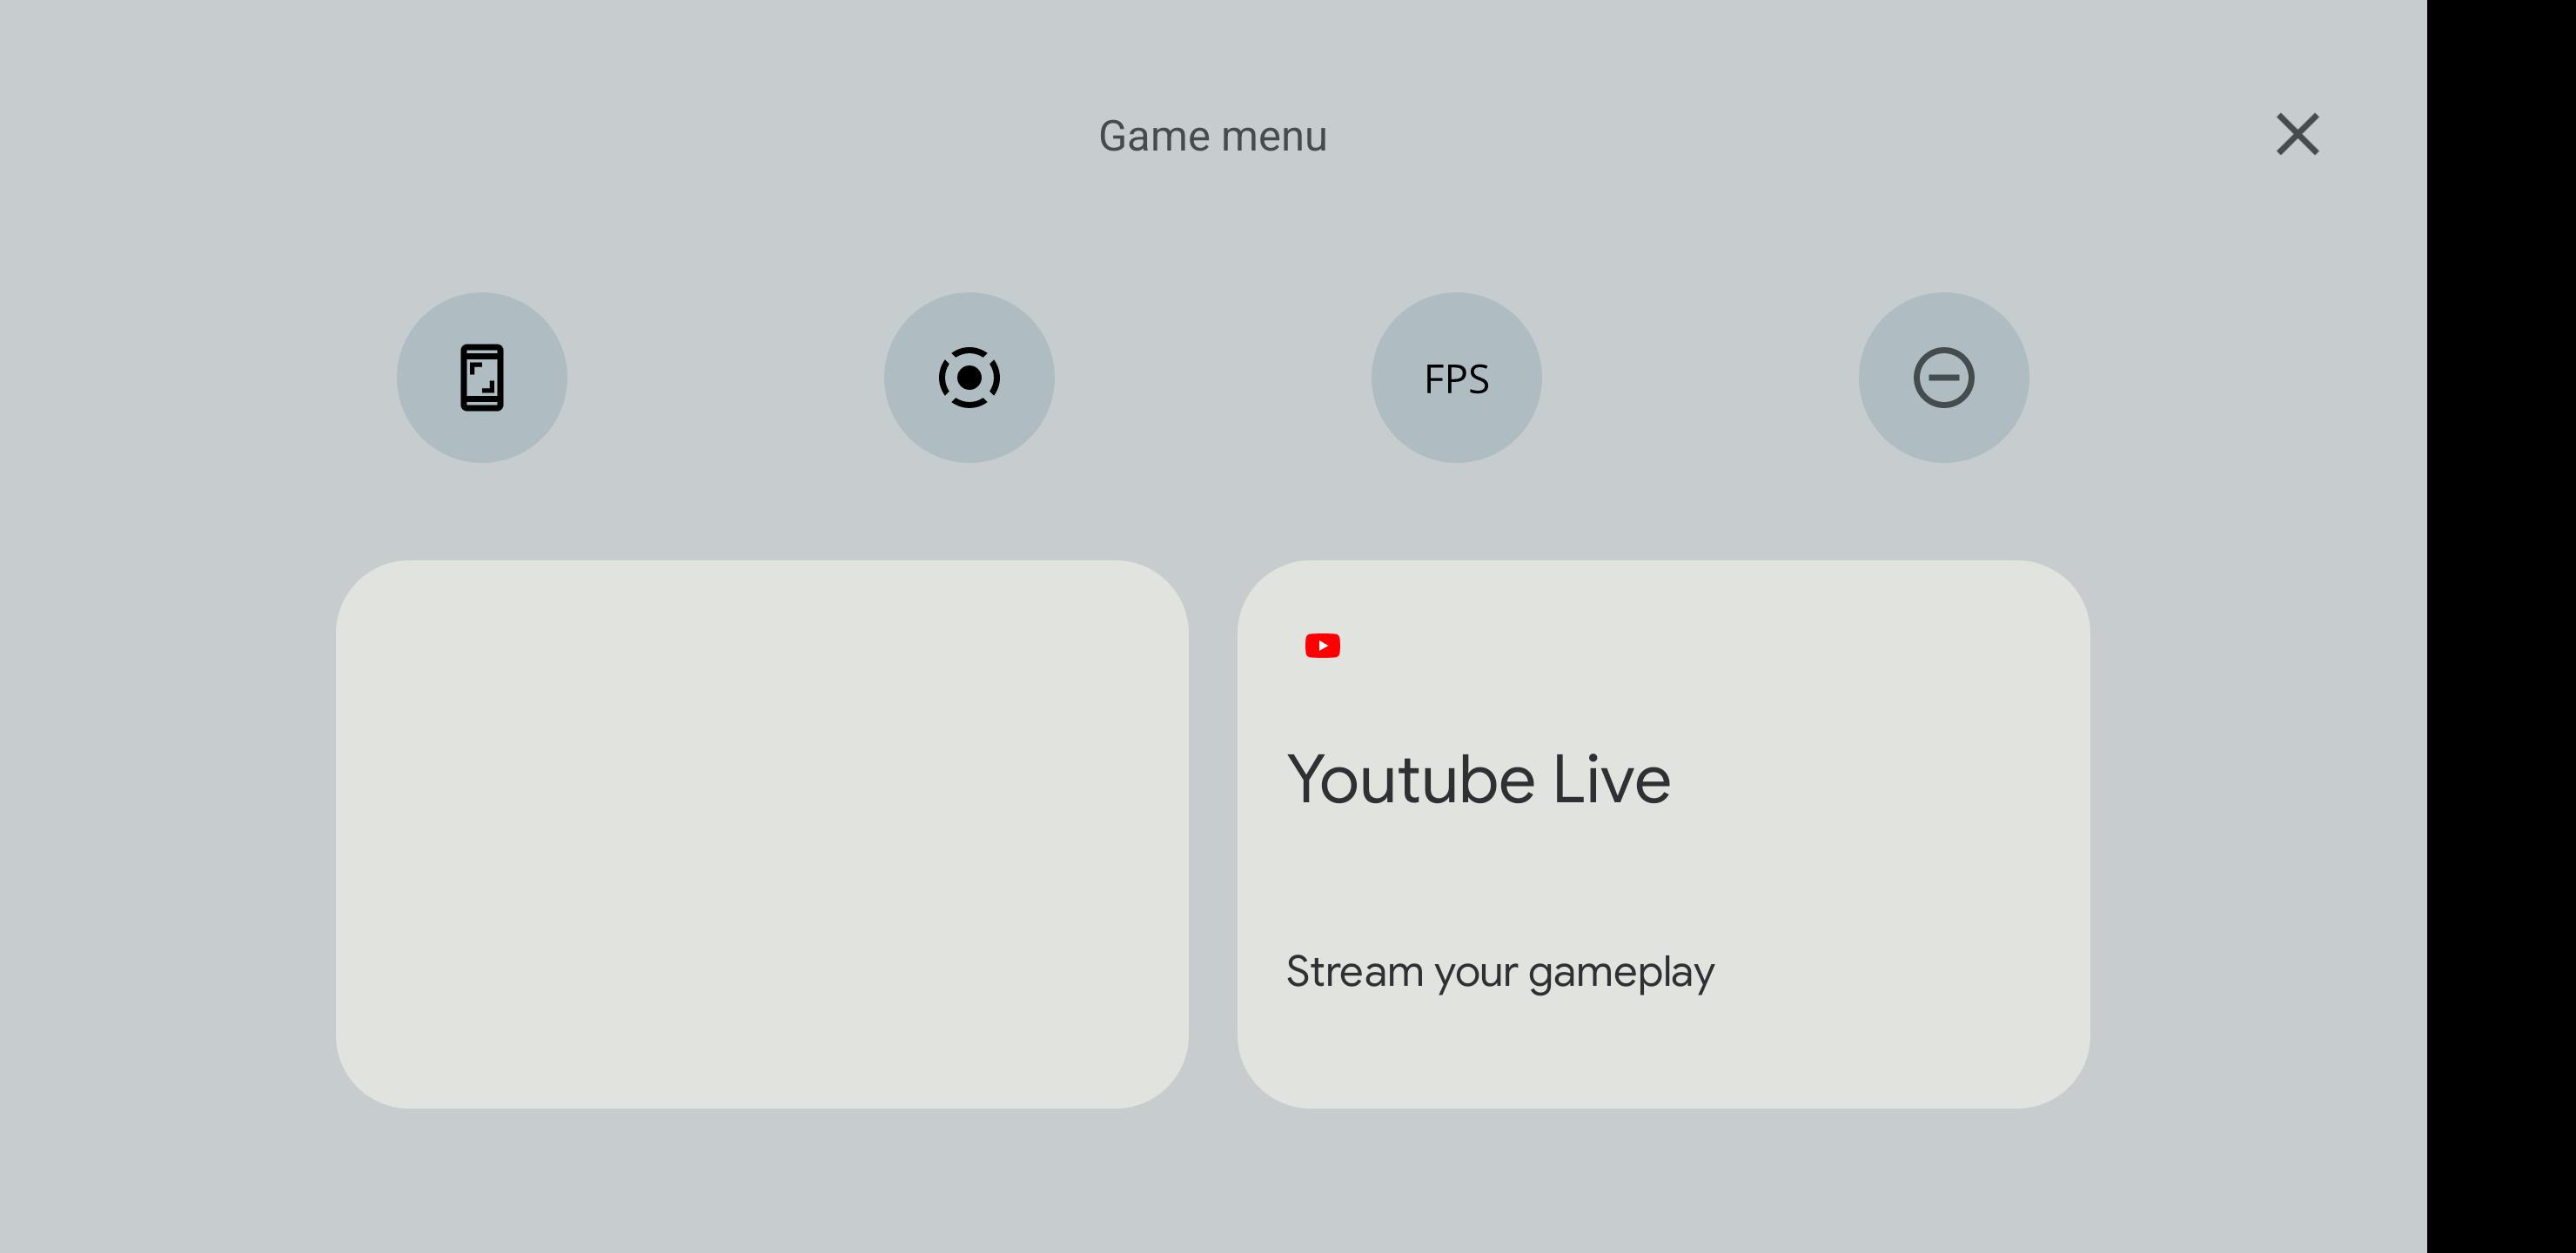 android 12 game dashboard screenshot